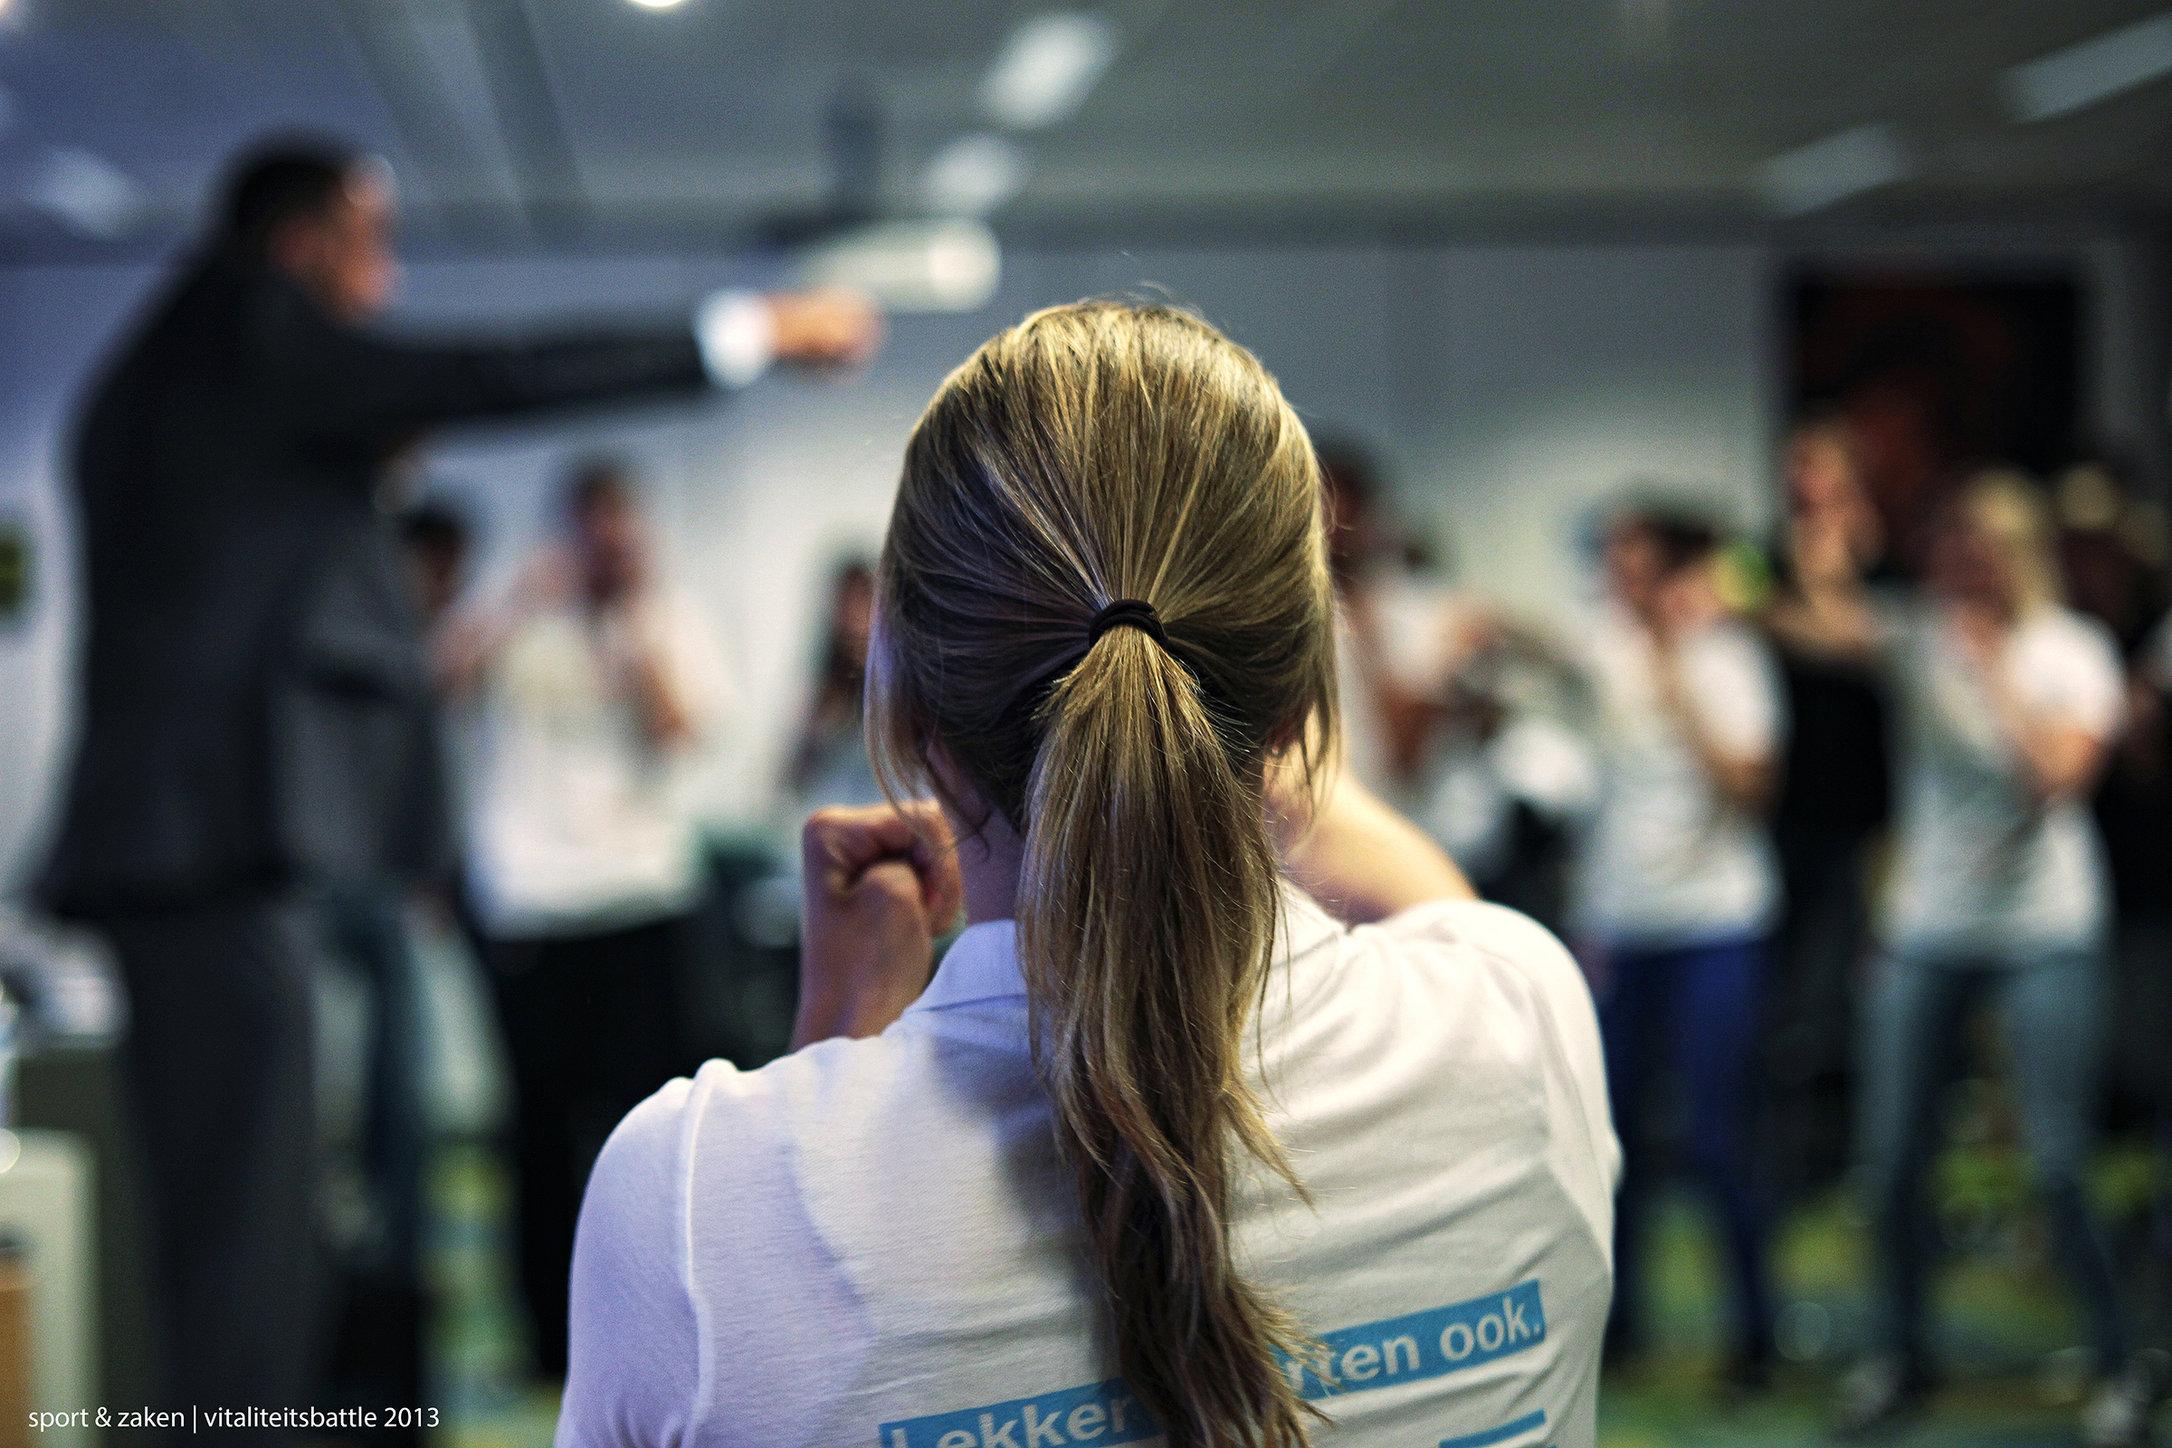 Sport & Zaken tijdens Vitality Games